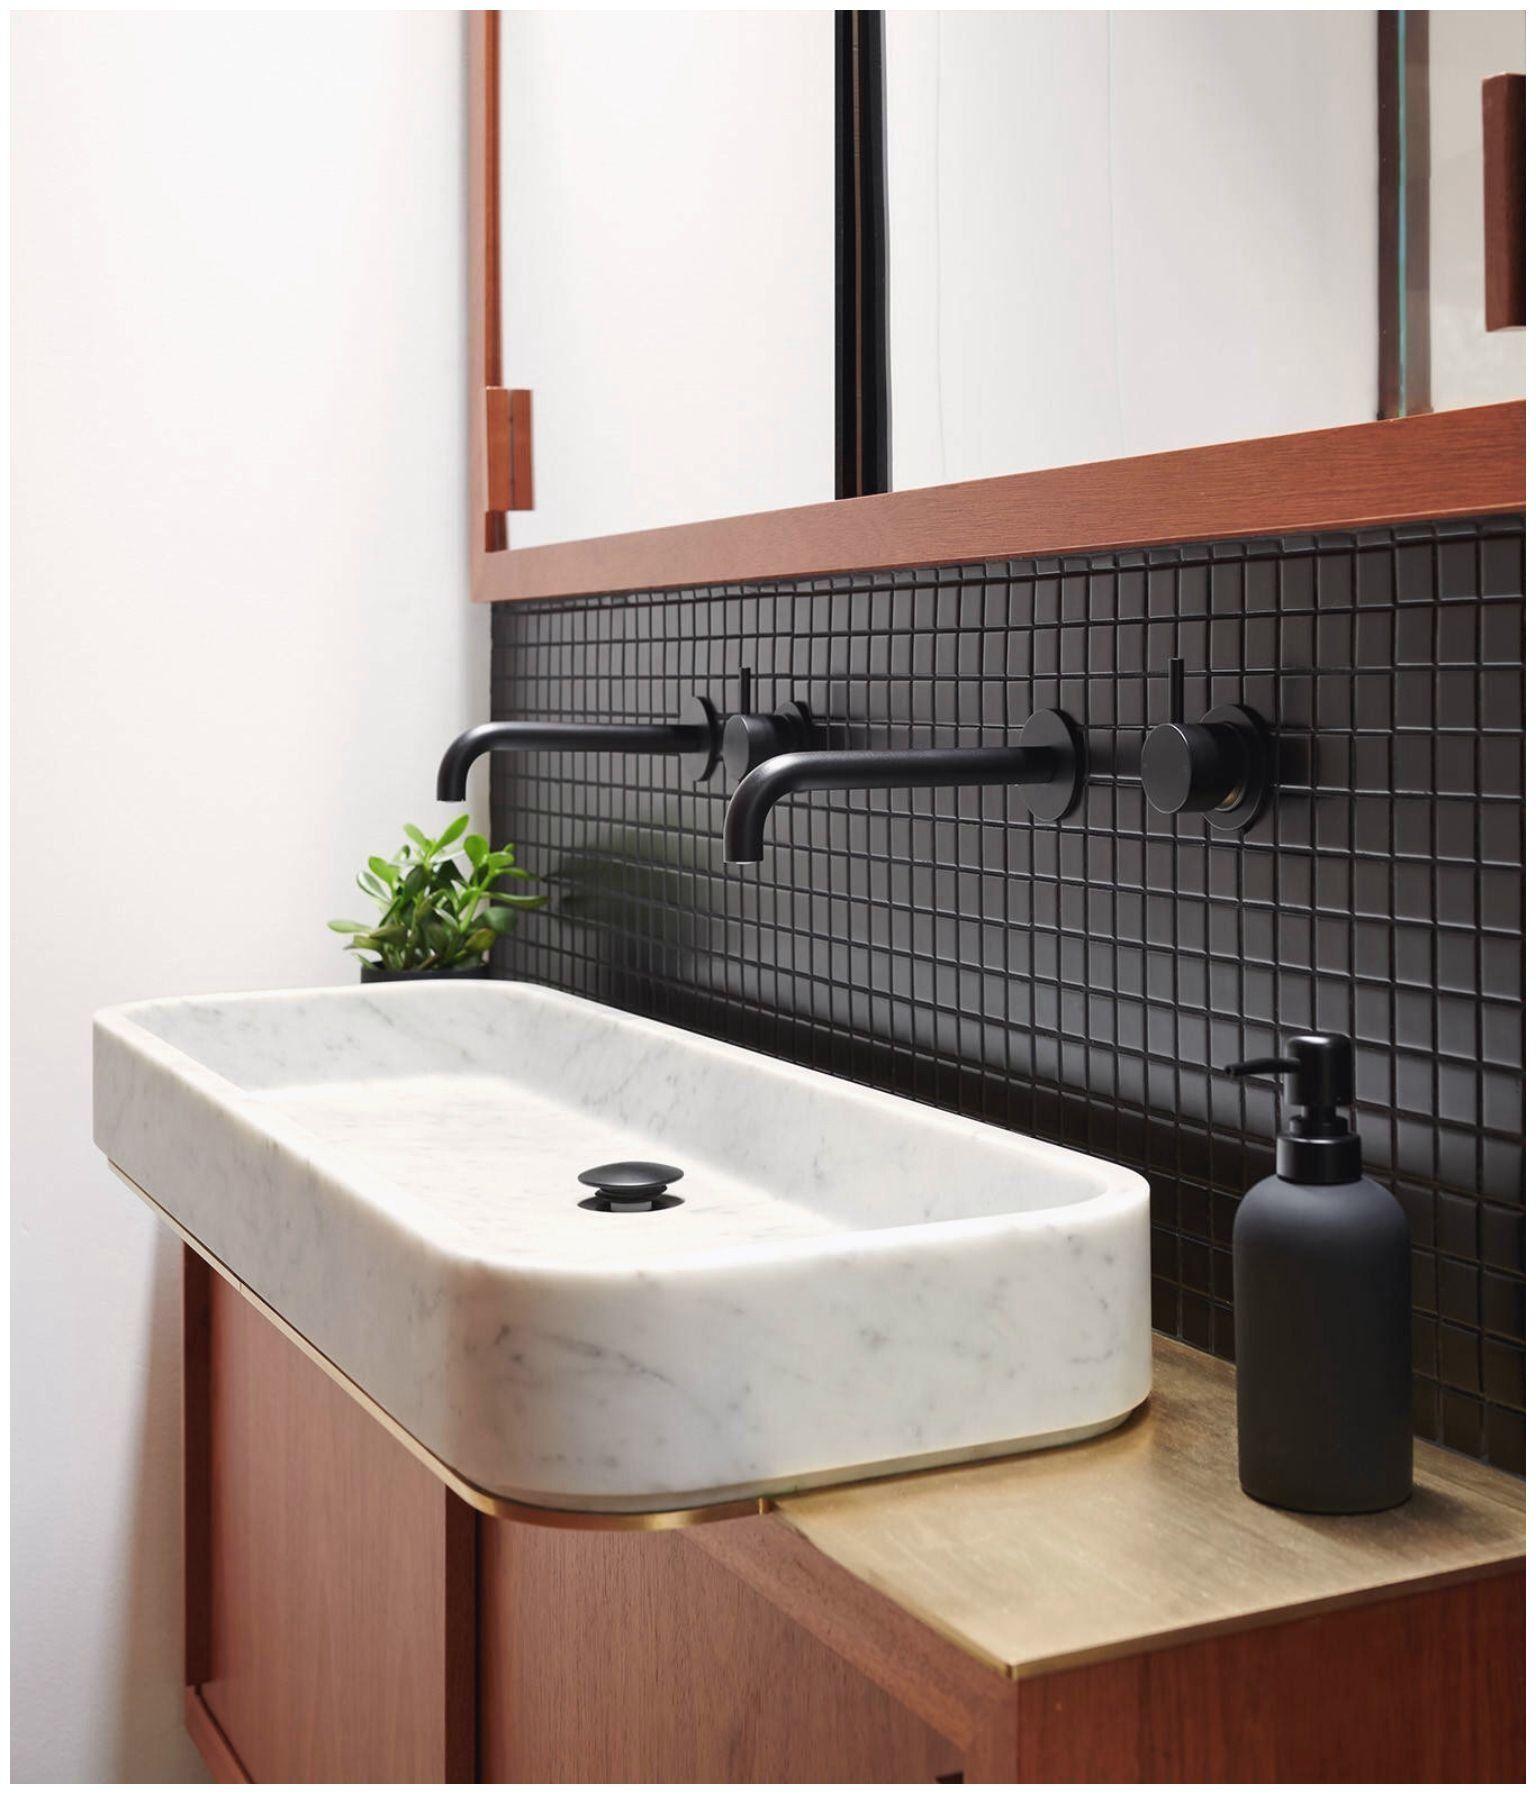 Bathroom Vanities Clearance Of Bathroom Vanities In 2020 Contemporary Bathroom Designs Bathroom Interior Design Master Bathroom Design